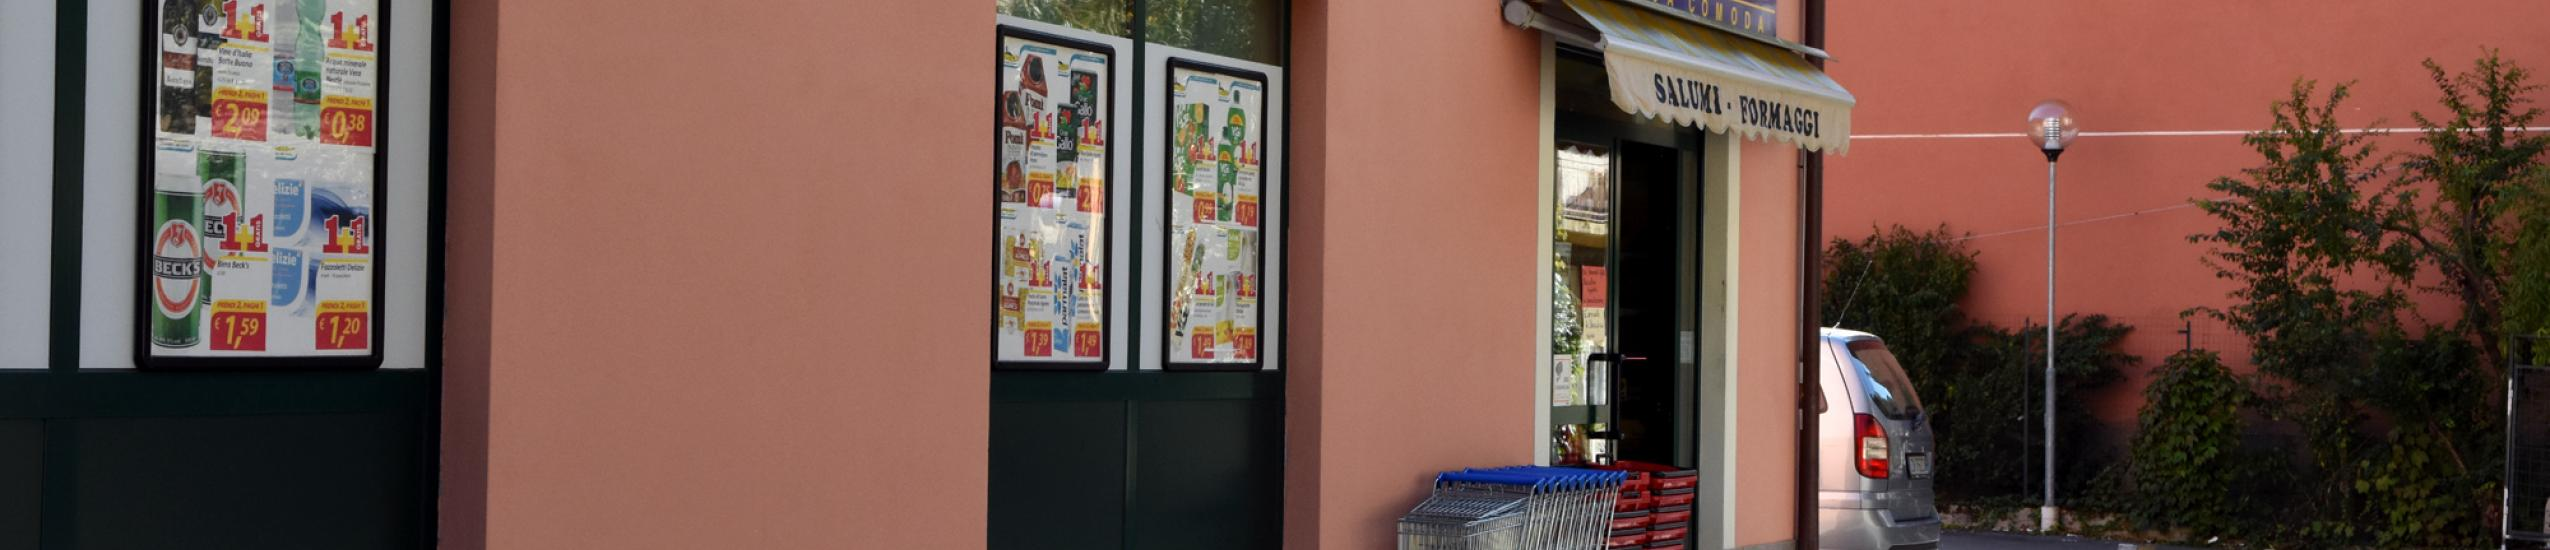 Minimarket Daneri Giuseppe - DiMeglio